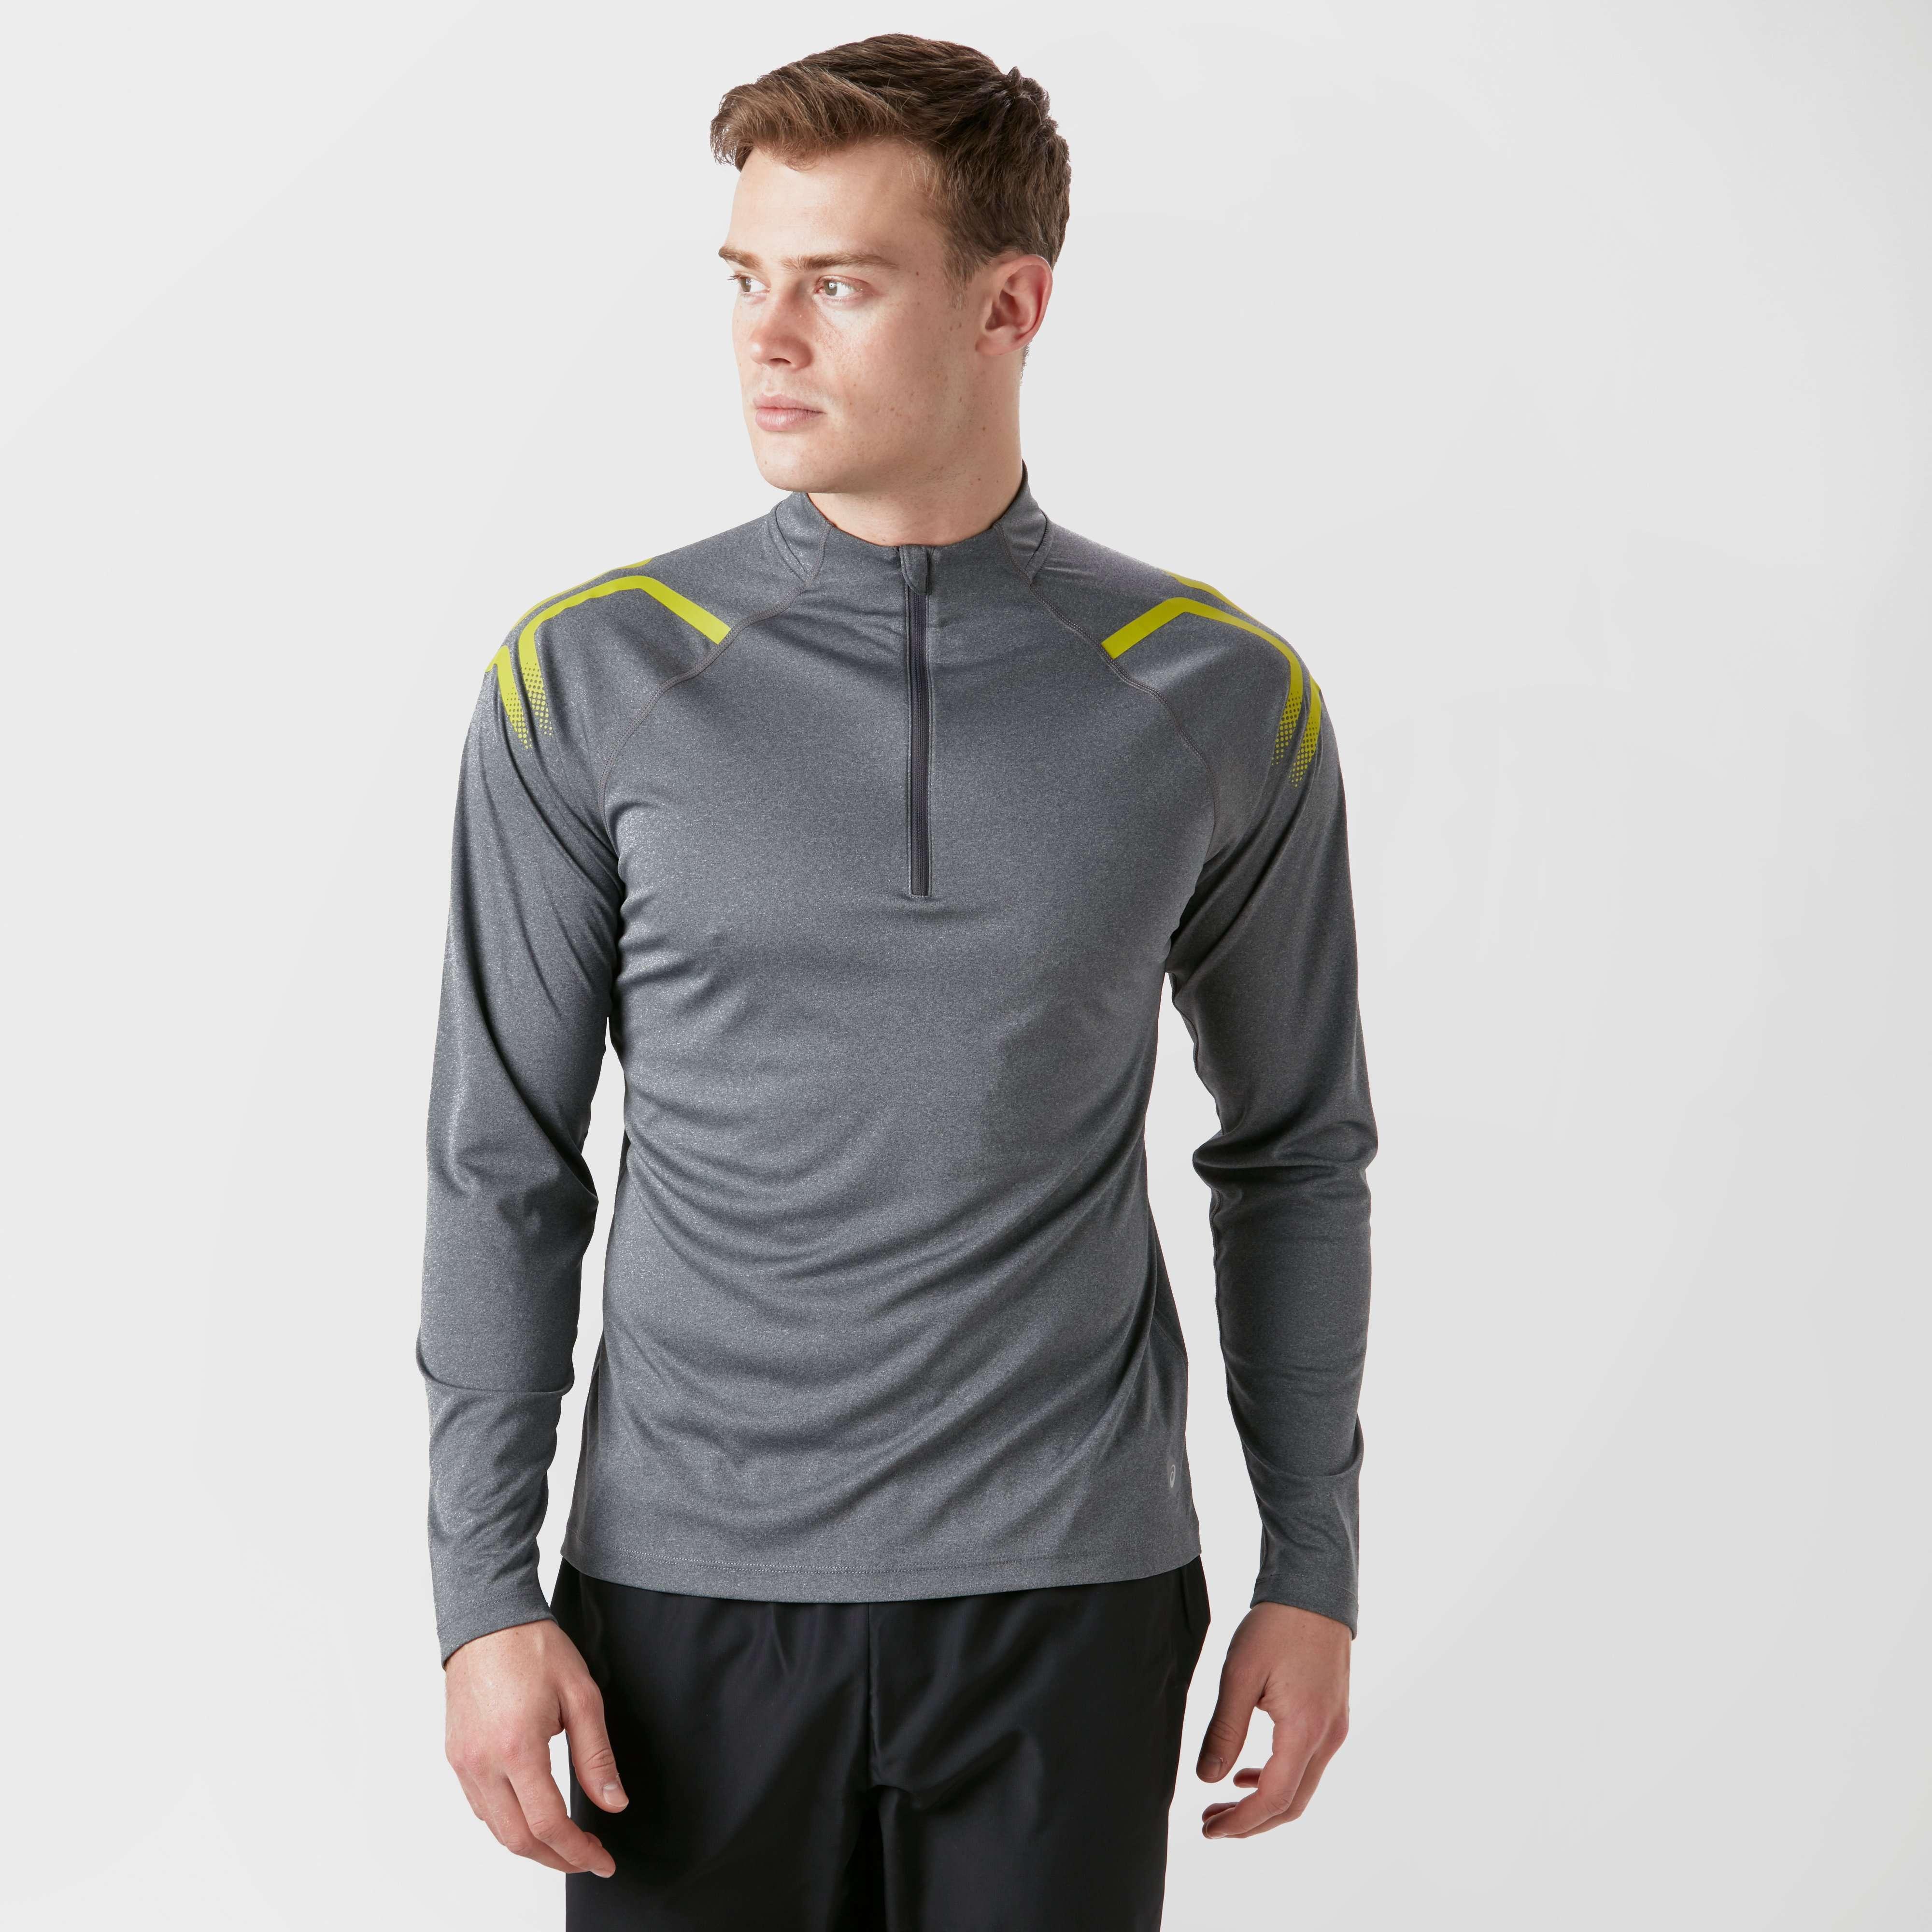 ASICS Men's Icon Long Sleeve Zip Tee